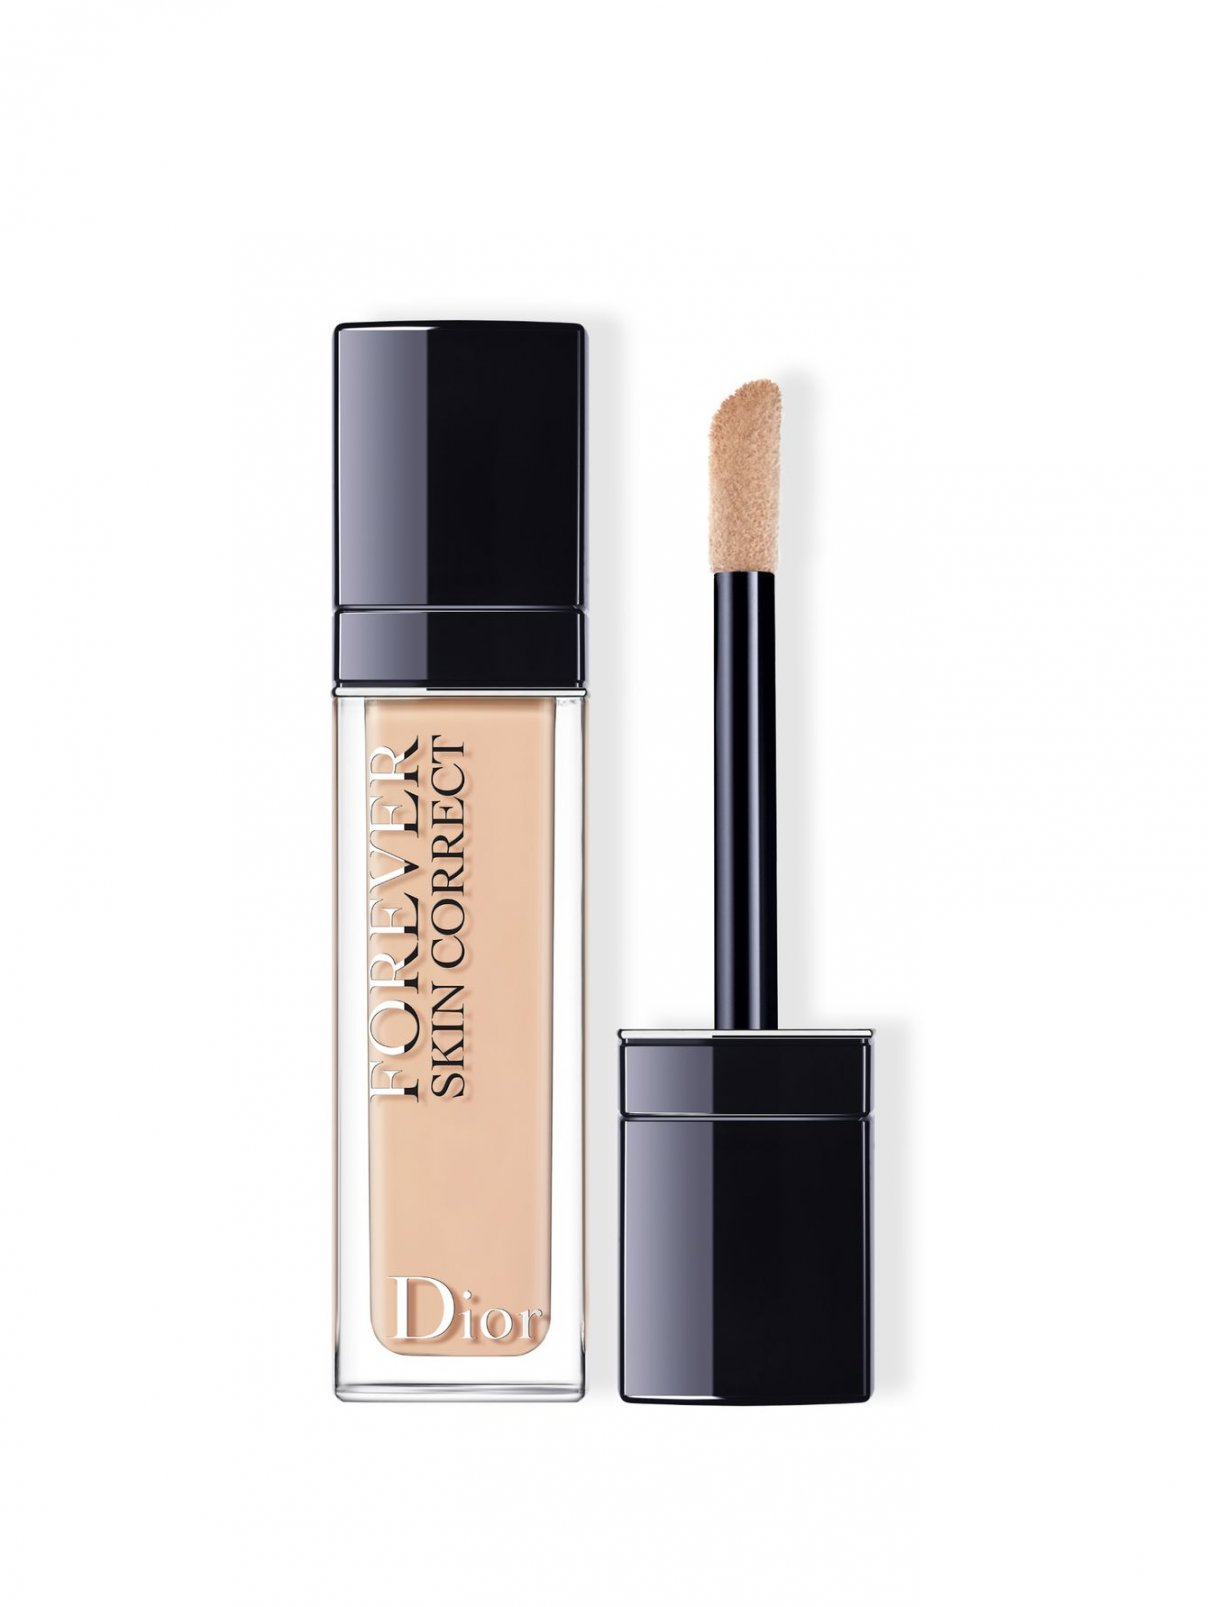 Dior Forever Skin Correct Ухаживающий корректор-крем 1,5N, 11 мл Christian Dior  –  Общий вид